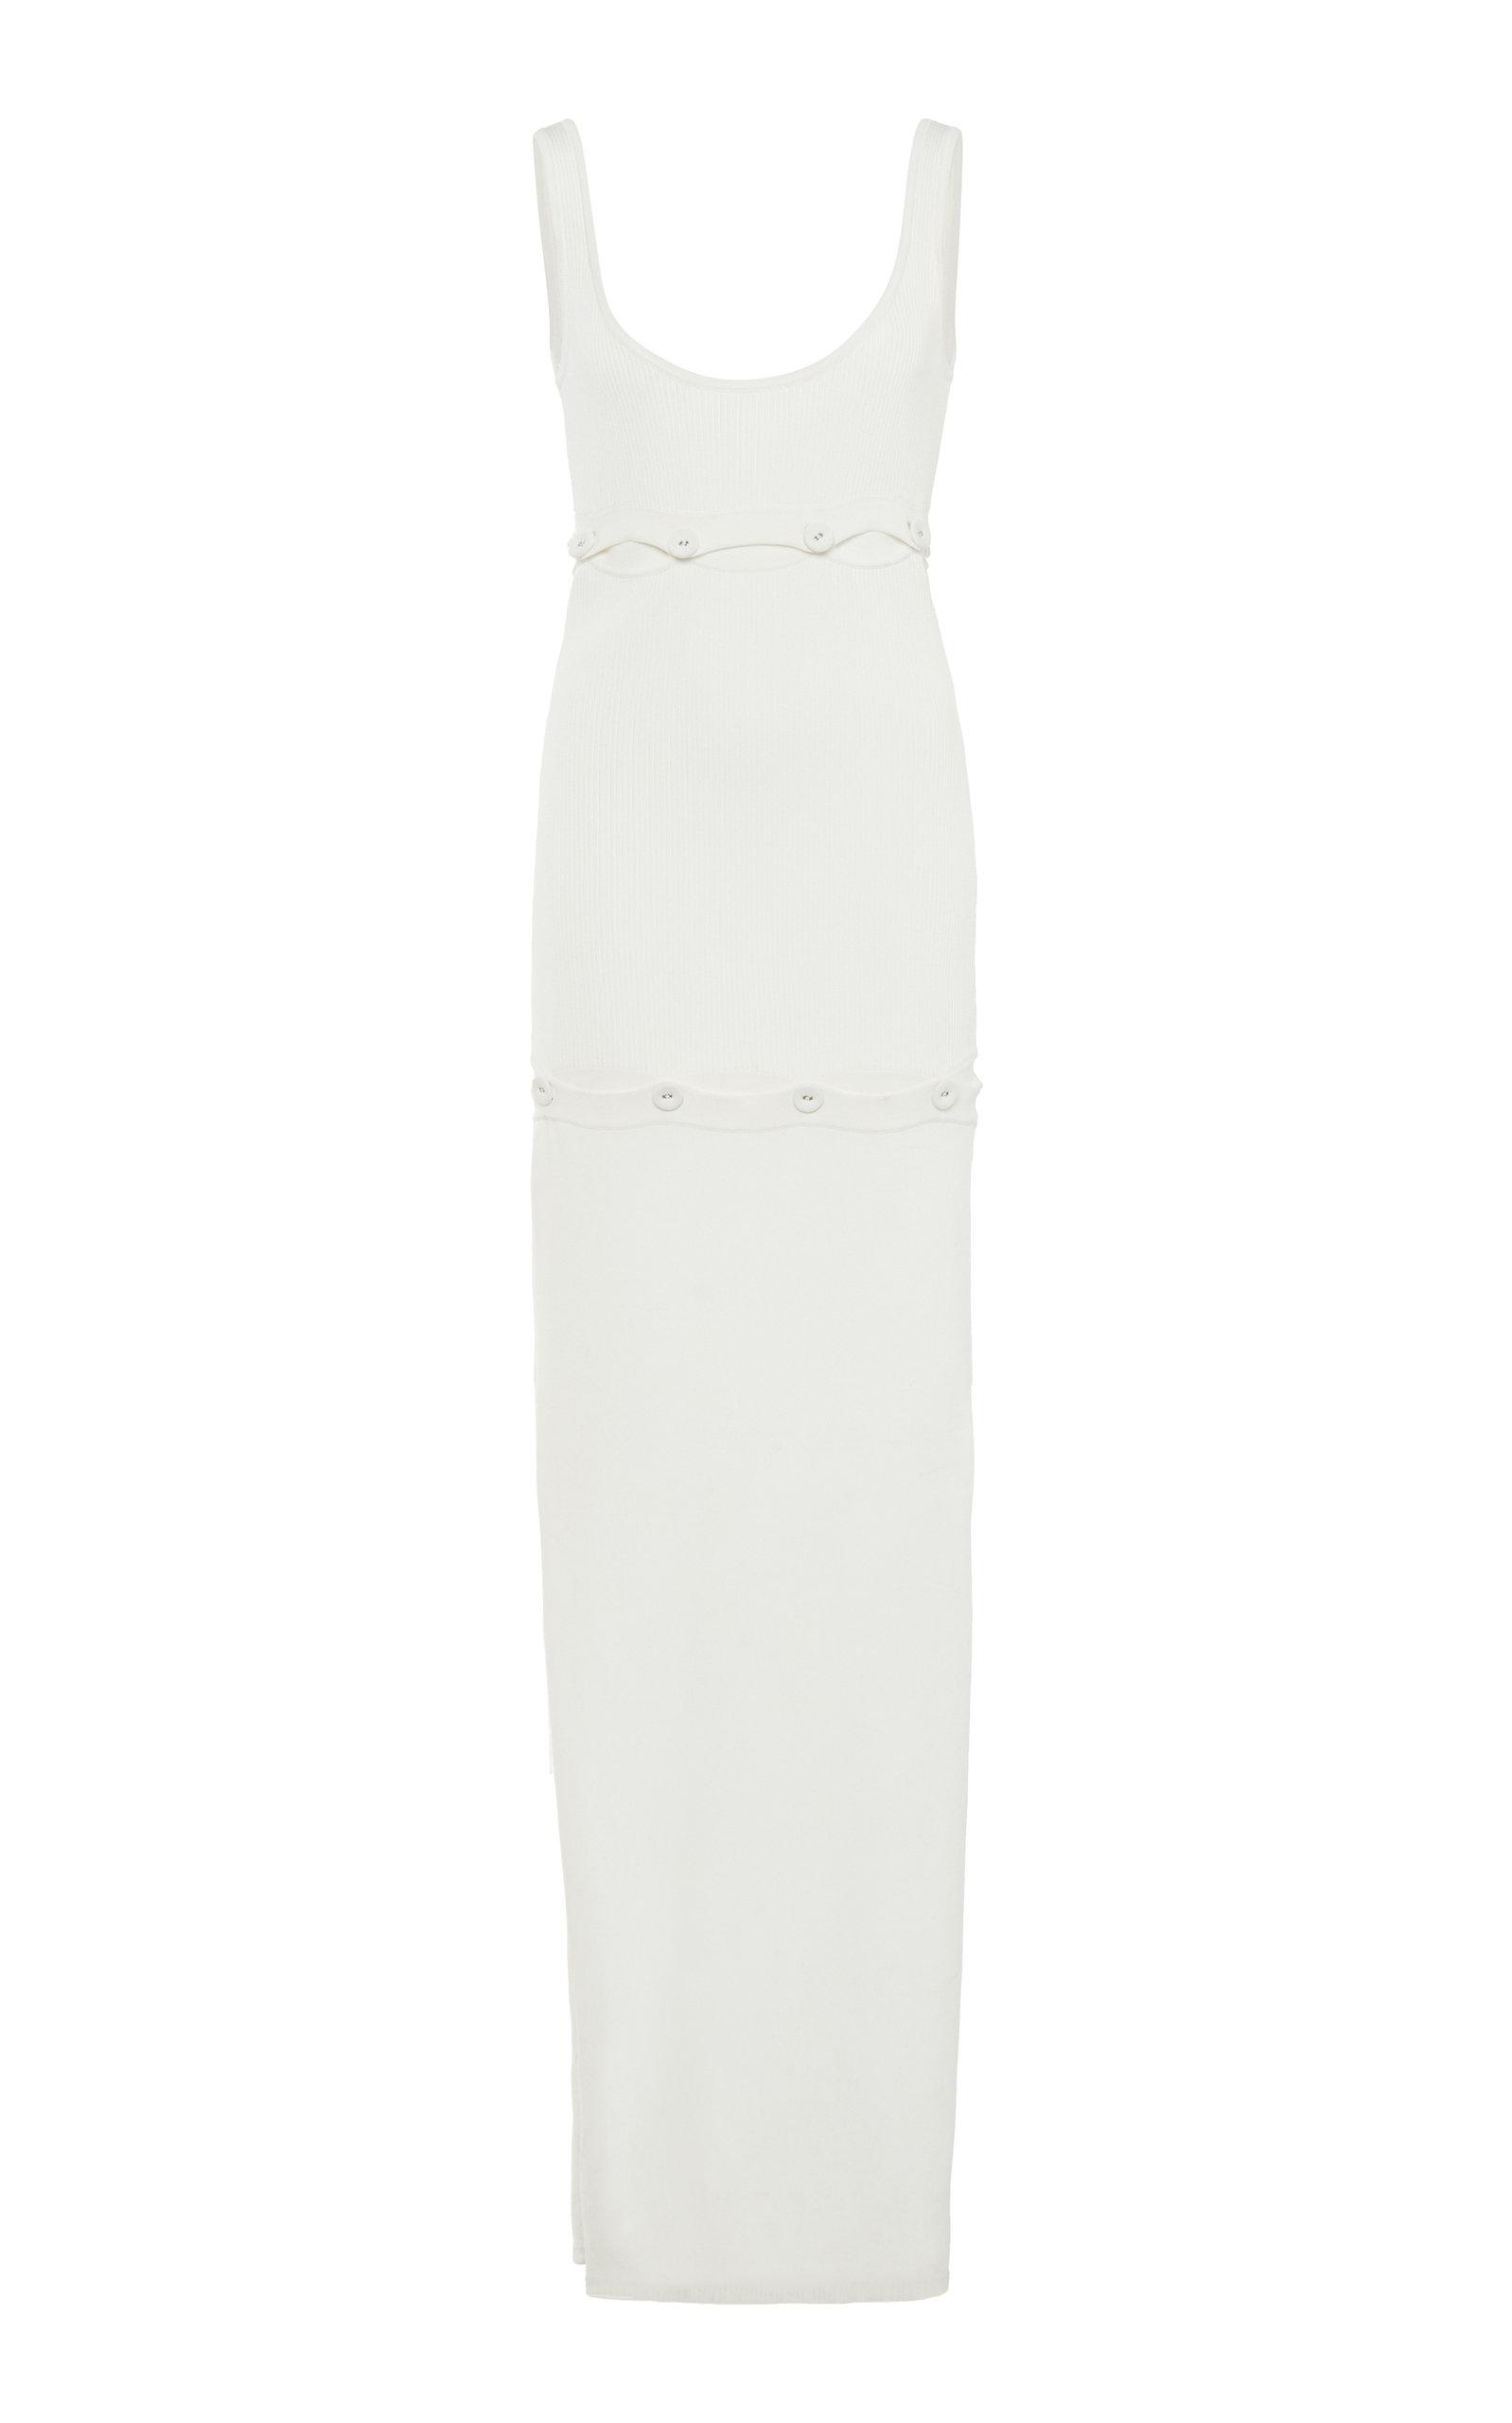 Buy Christopher Esber Deconstructed Ribbed-Knit Tank Dress online, shop Christopher Esber at the best price